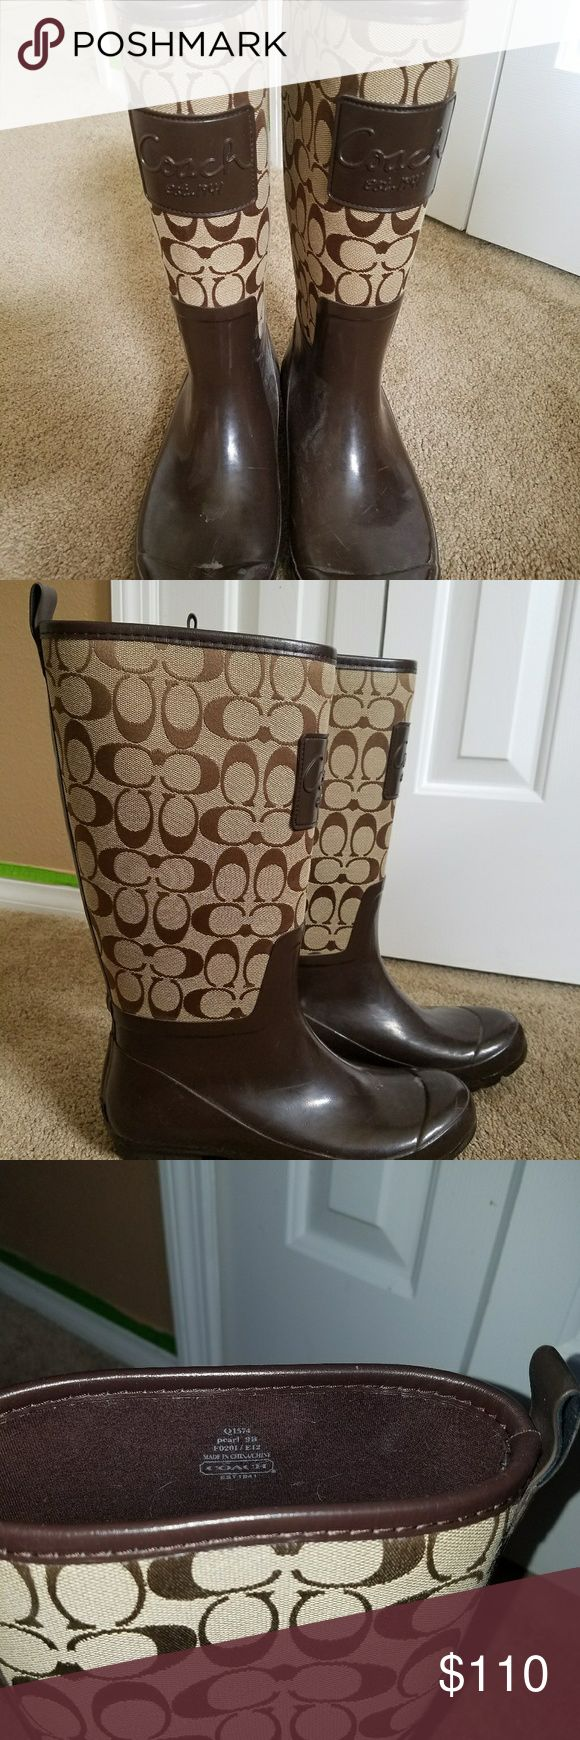 COACH rain boots Brown signature coach rain boots Coach Shoes Winter & Rain Boots